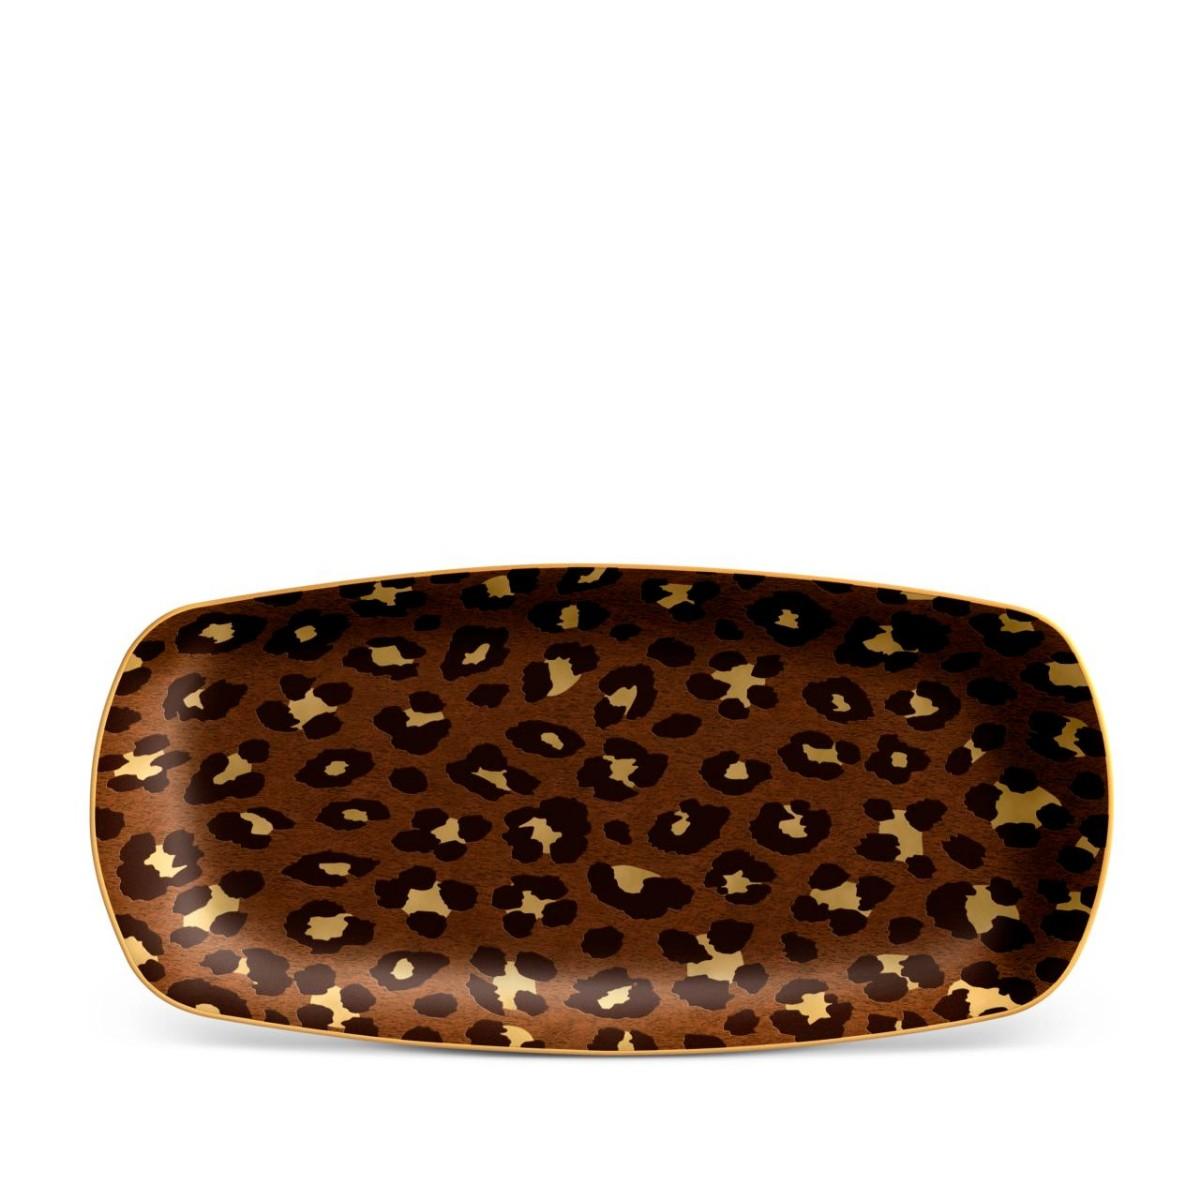 L'Objet I Leopard Rectangular Tray - Medium